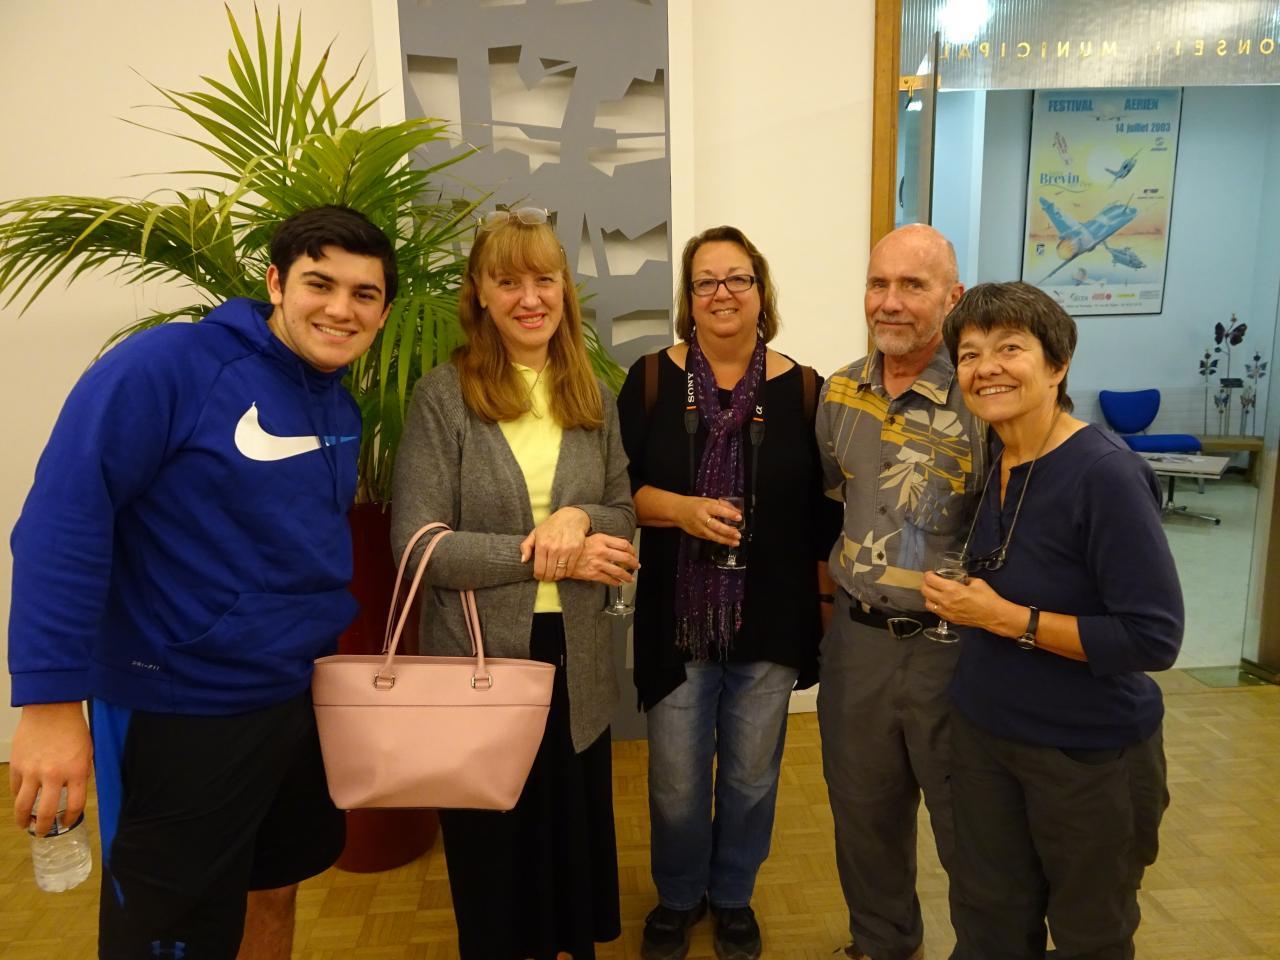 016-DSC01387 - Patrick, Anne Marie, Diana, Michael et Alicia